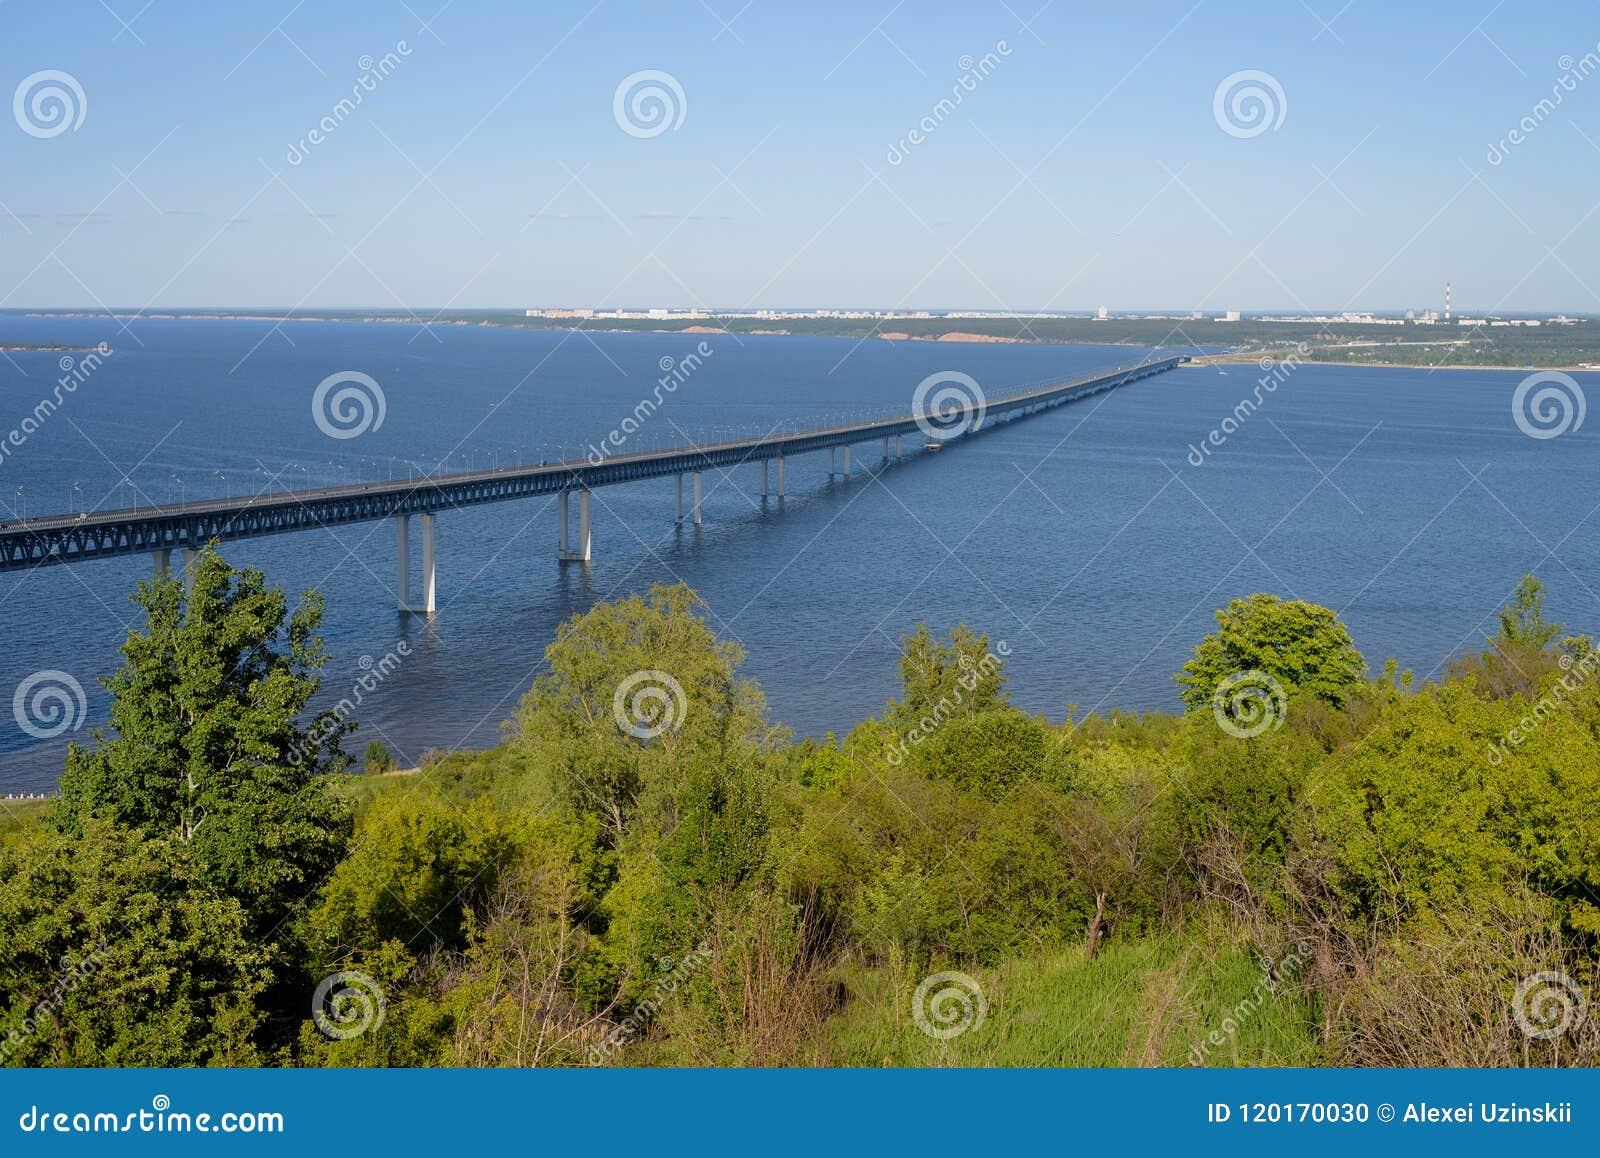 Ulyanovsk, Rusland - 06 30 2018: President Bridge over de Volga rivier, de zomerdag